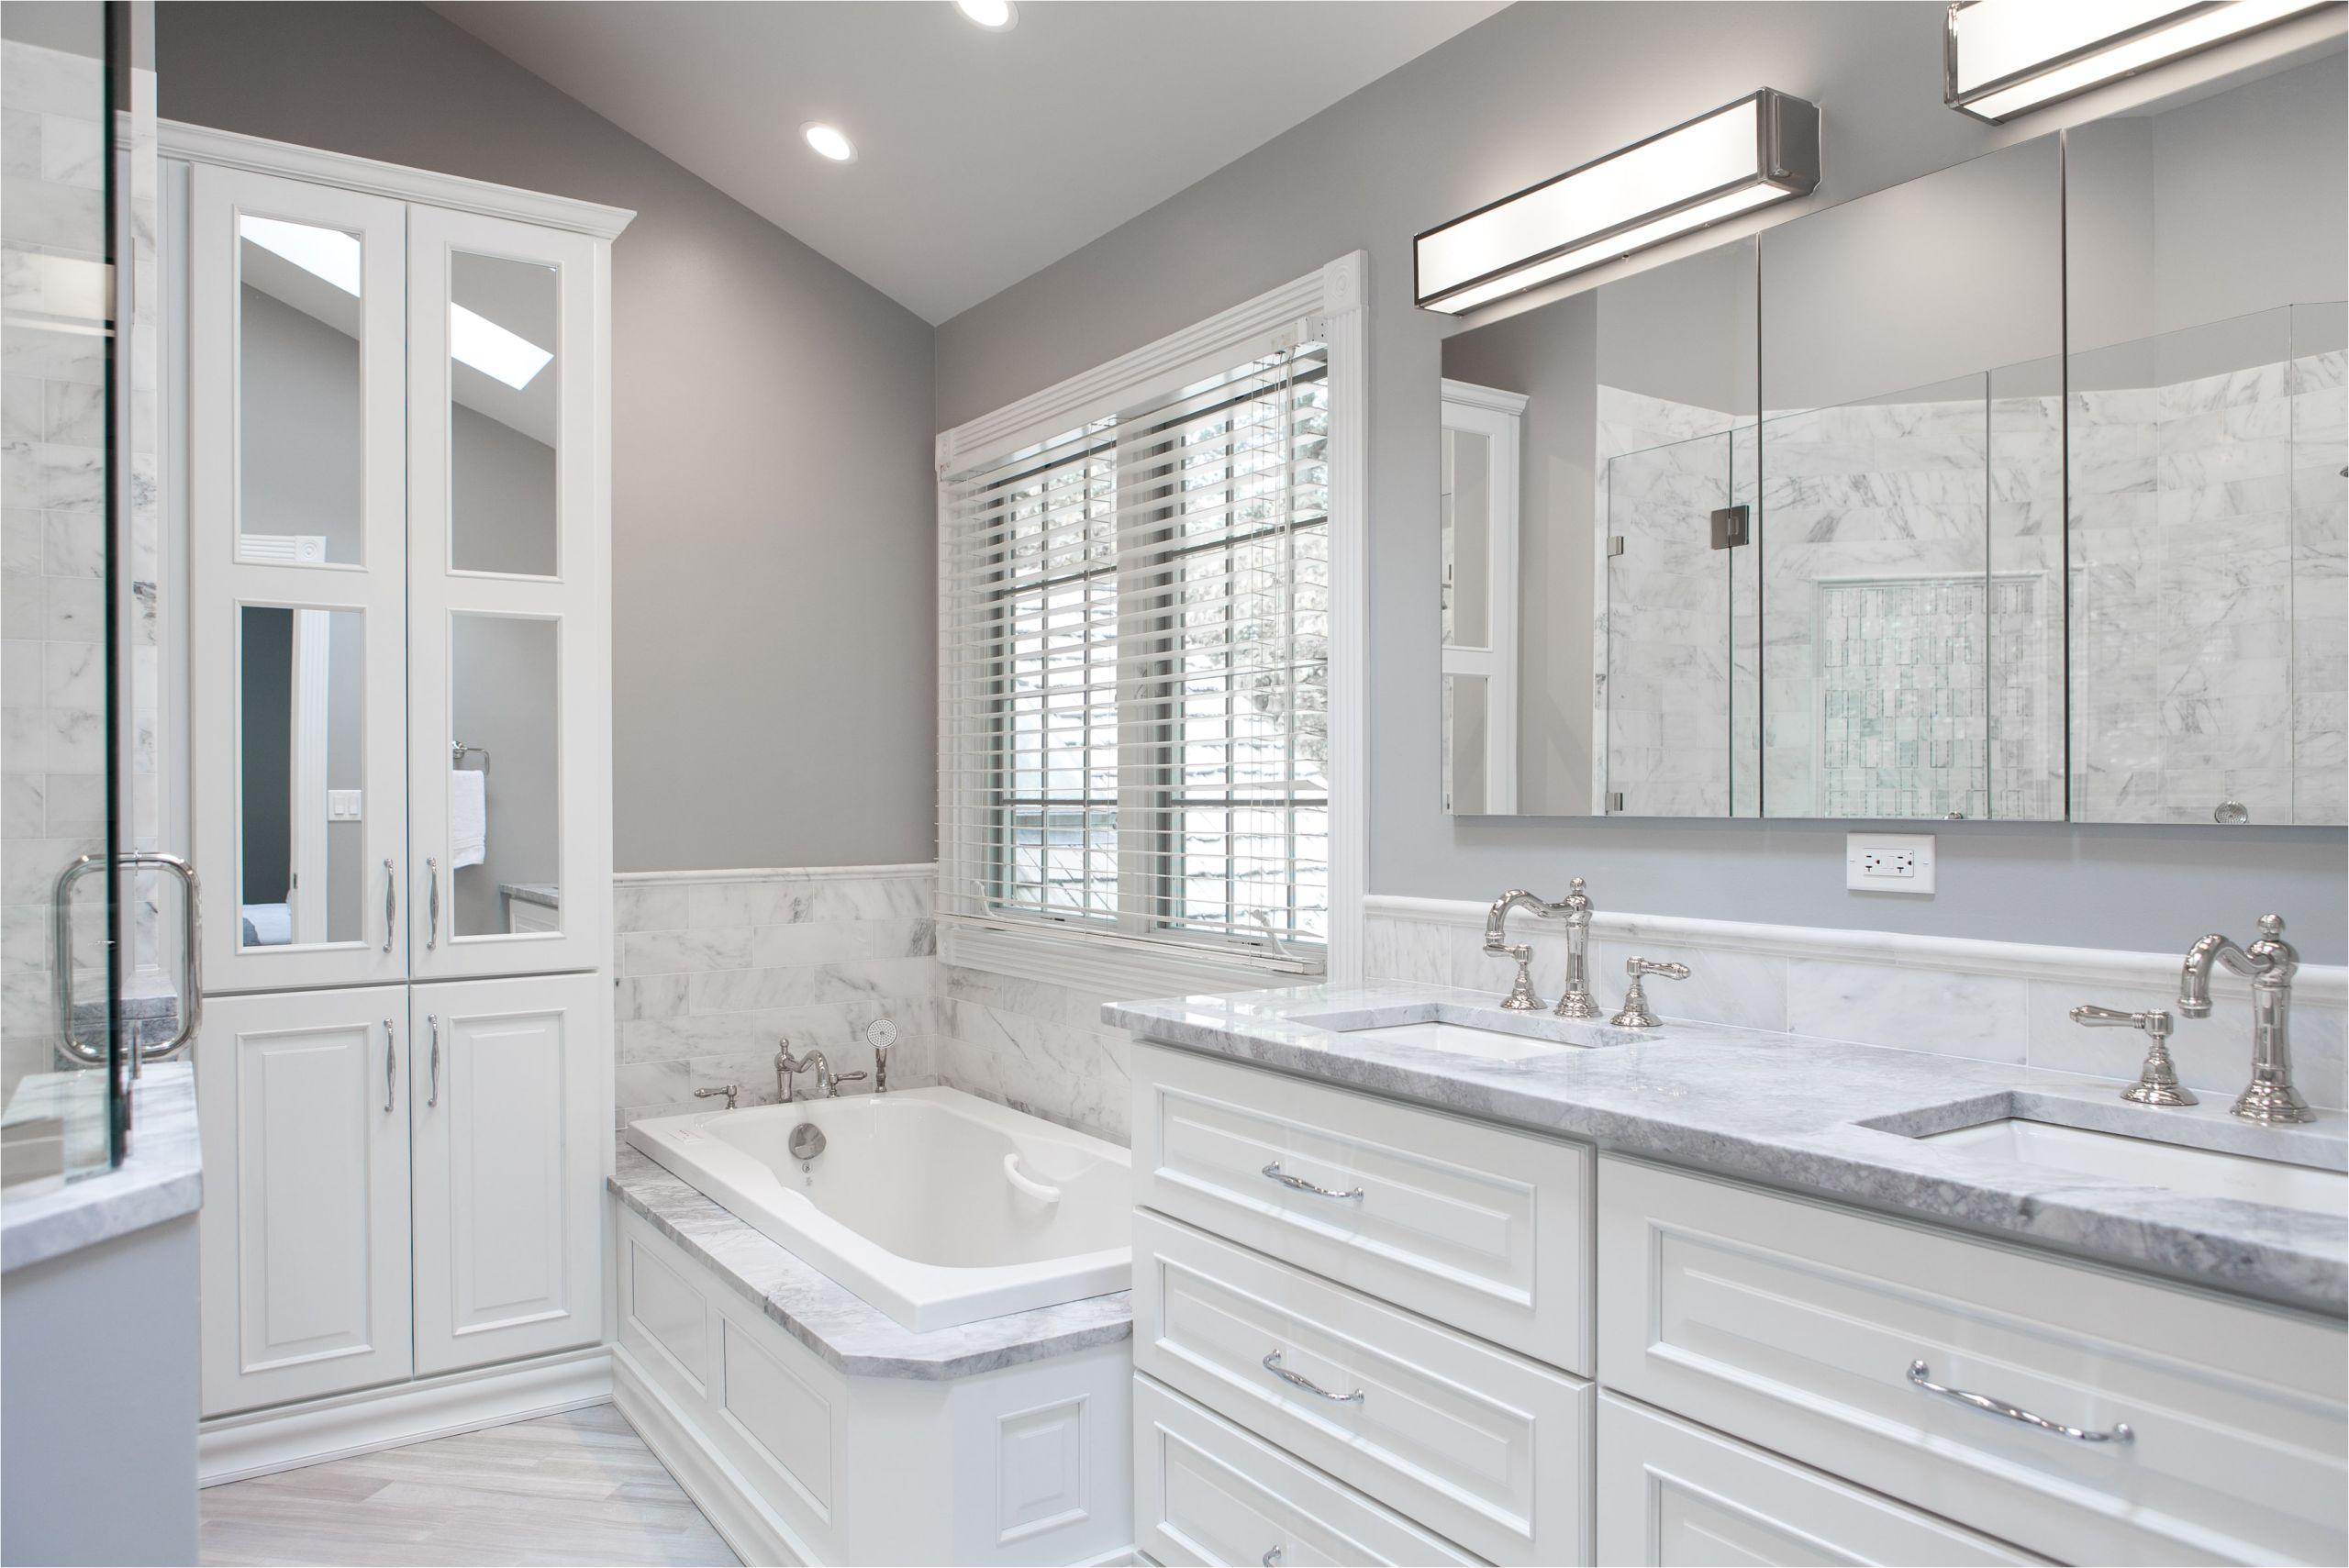 bathroom remodel cost in the chicago north shore area